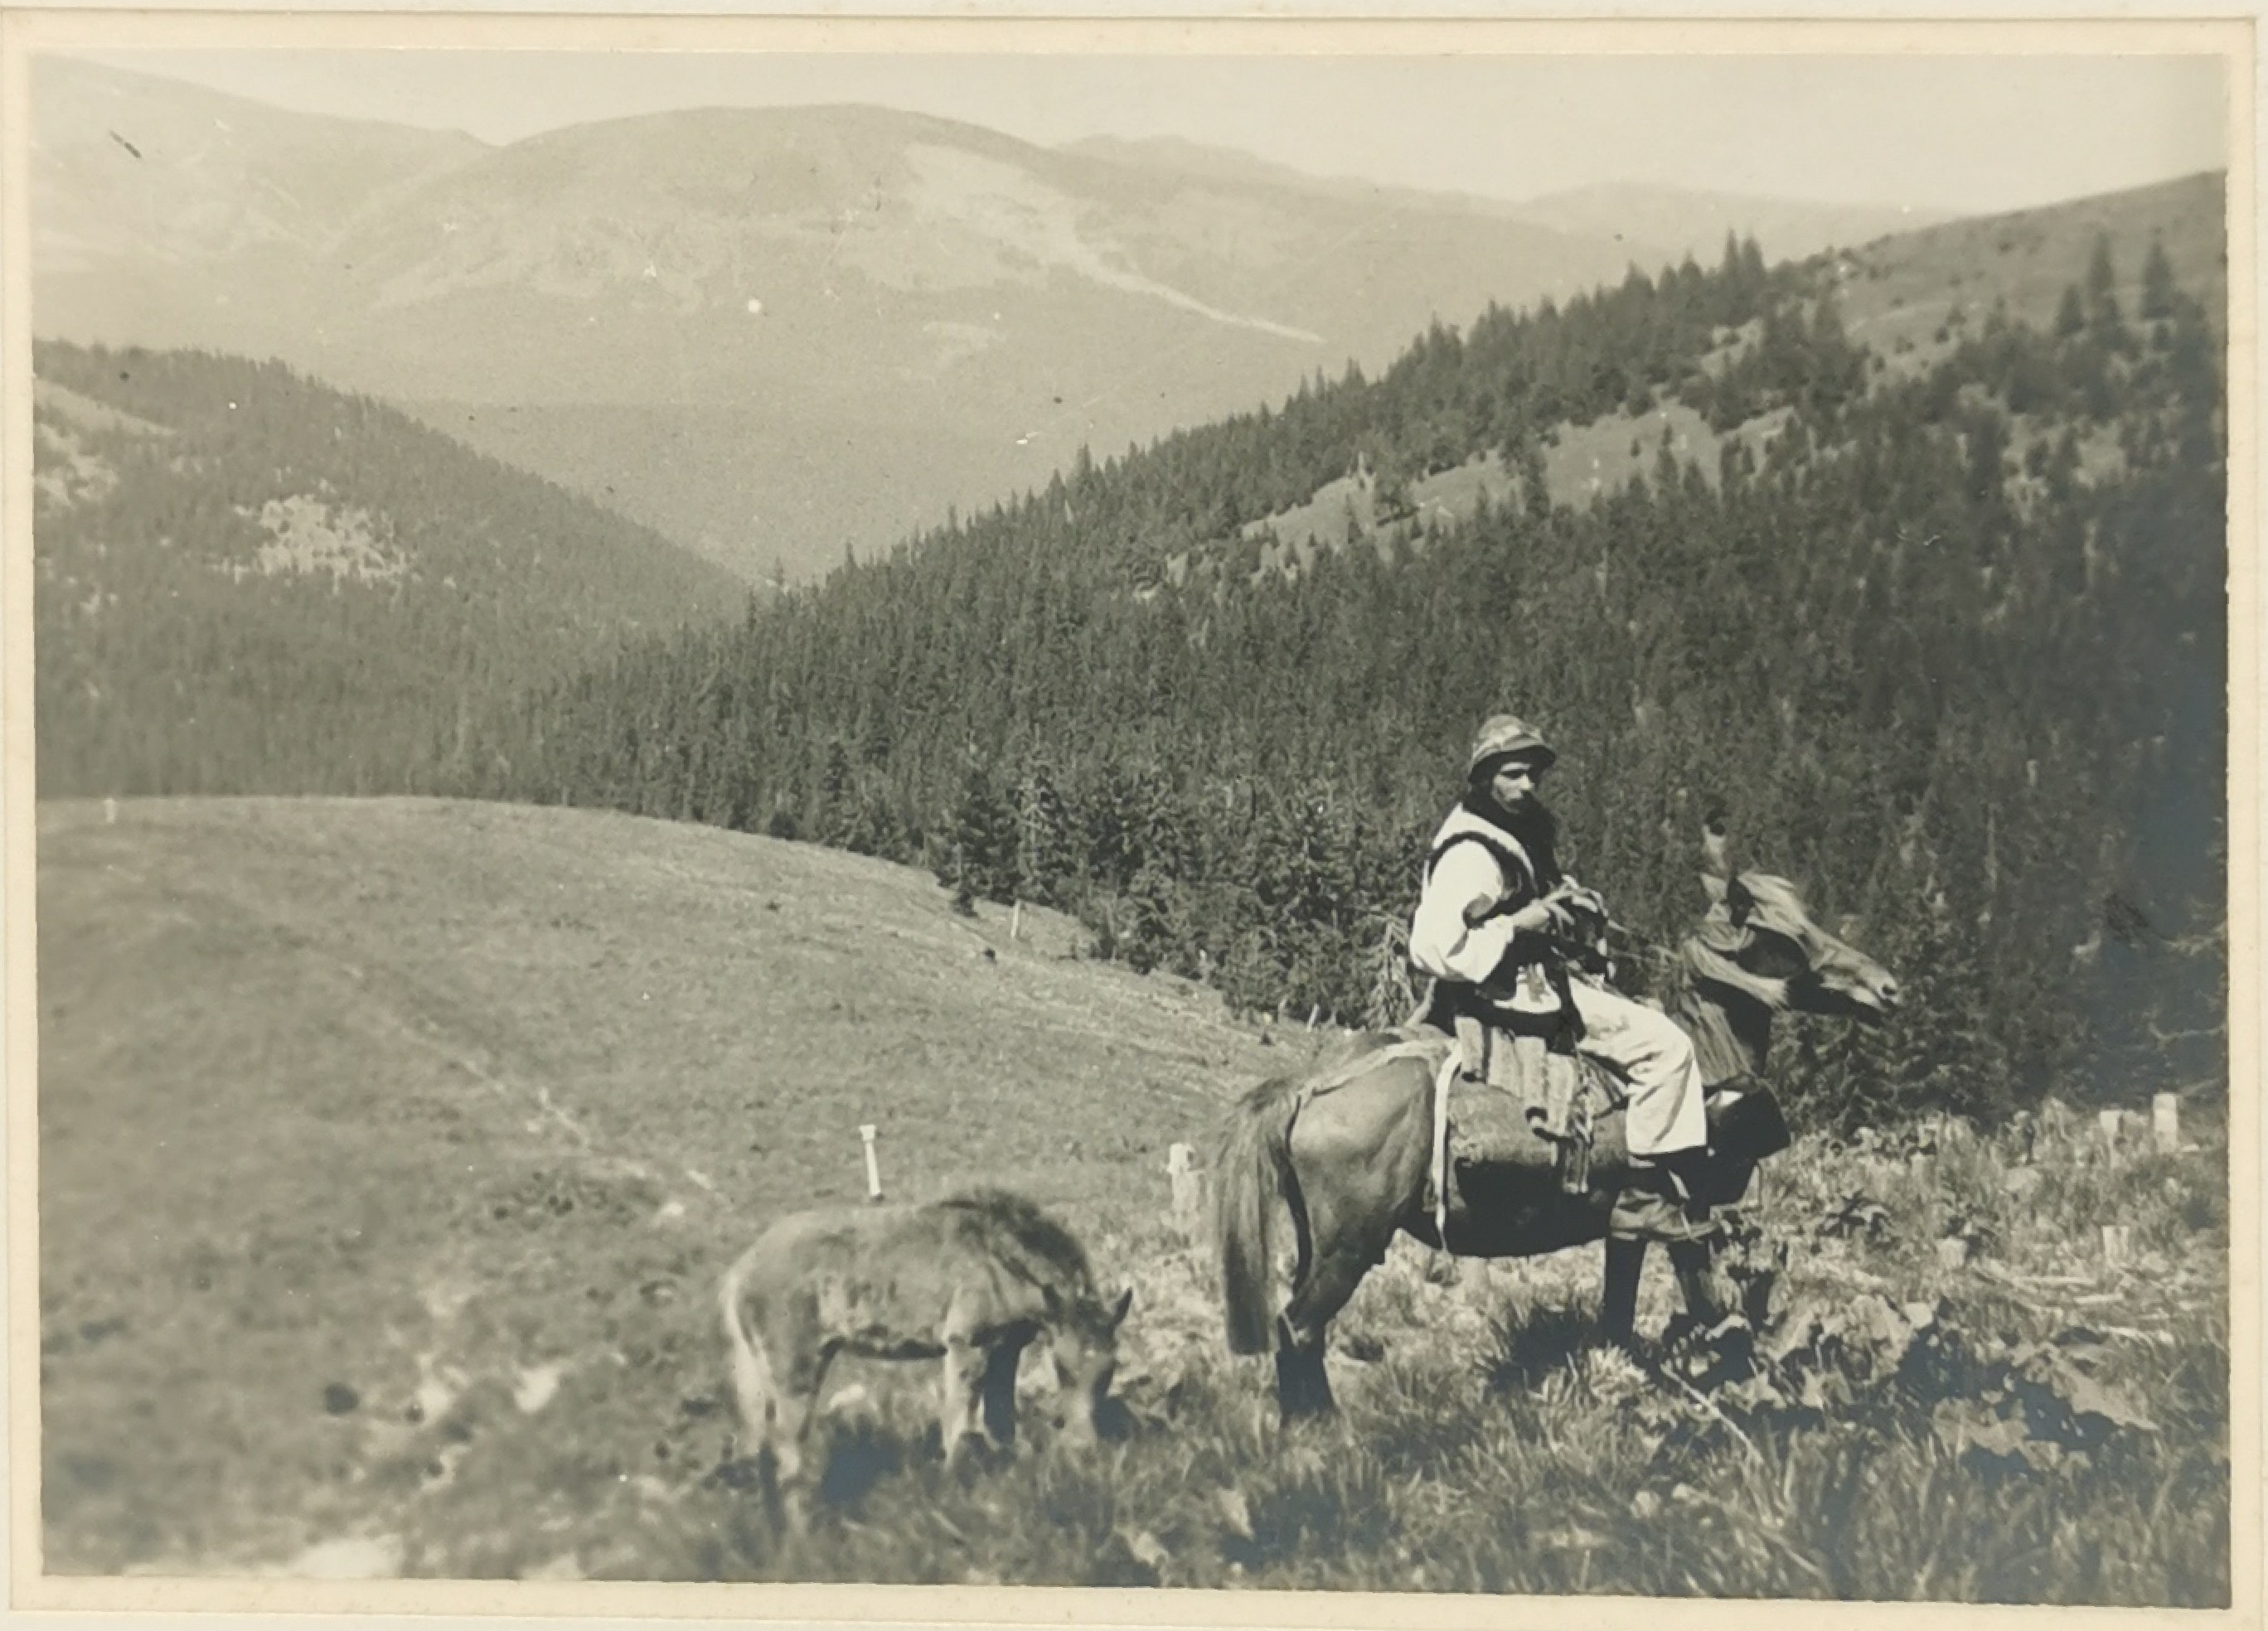 Hucuł na koniu na tle gór